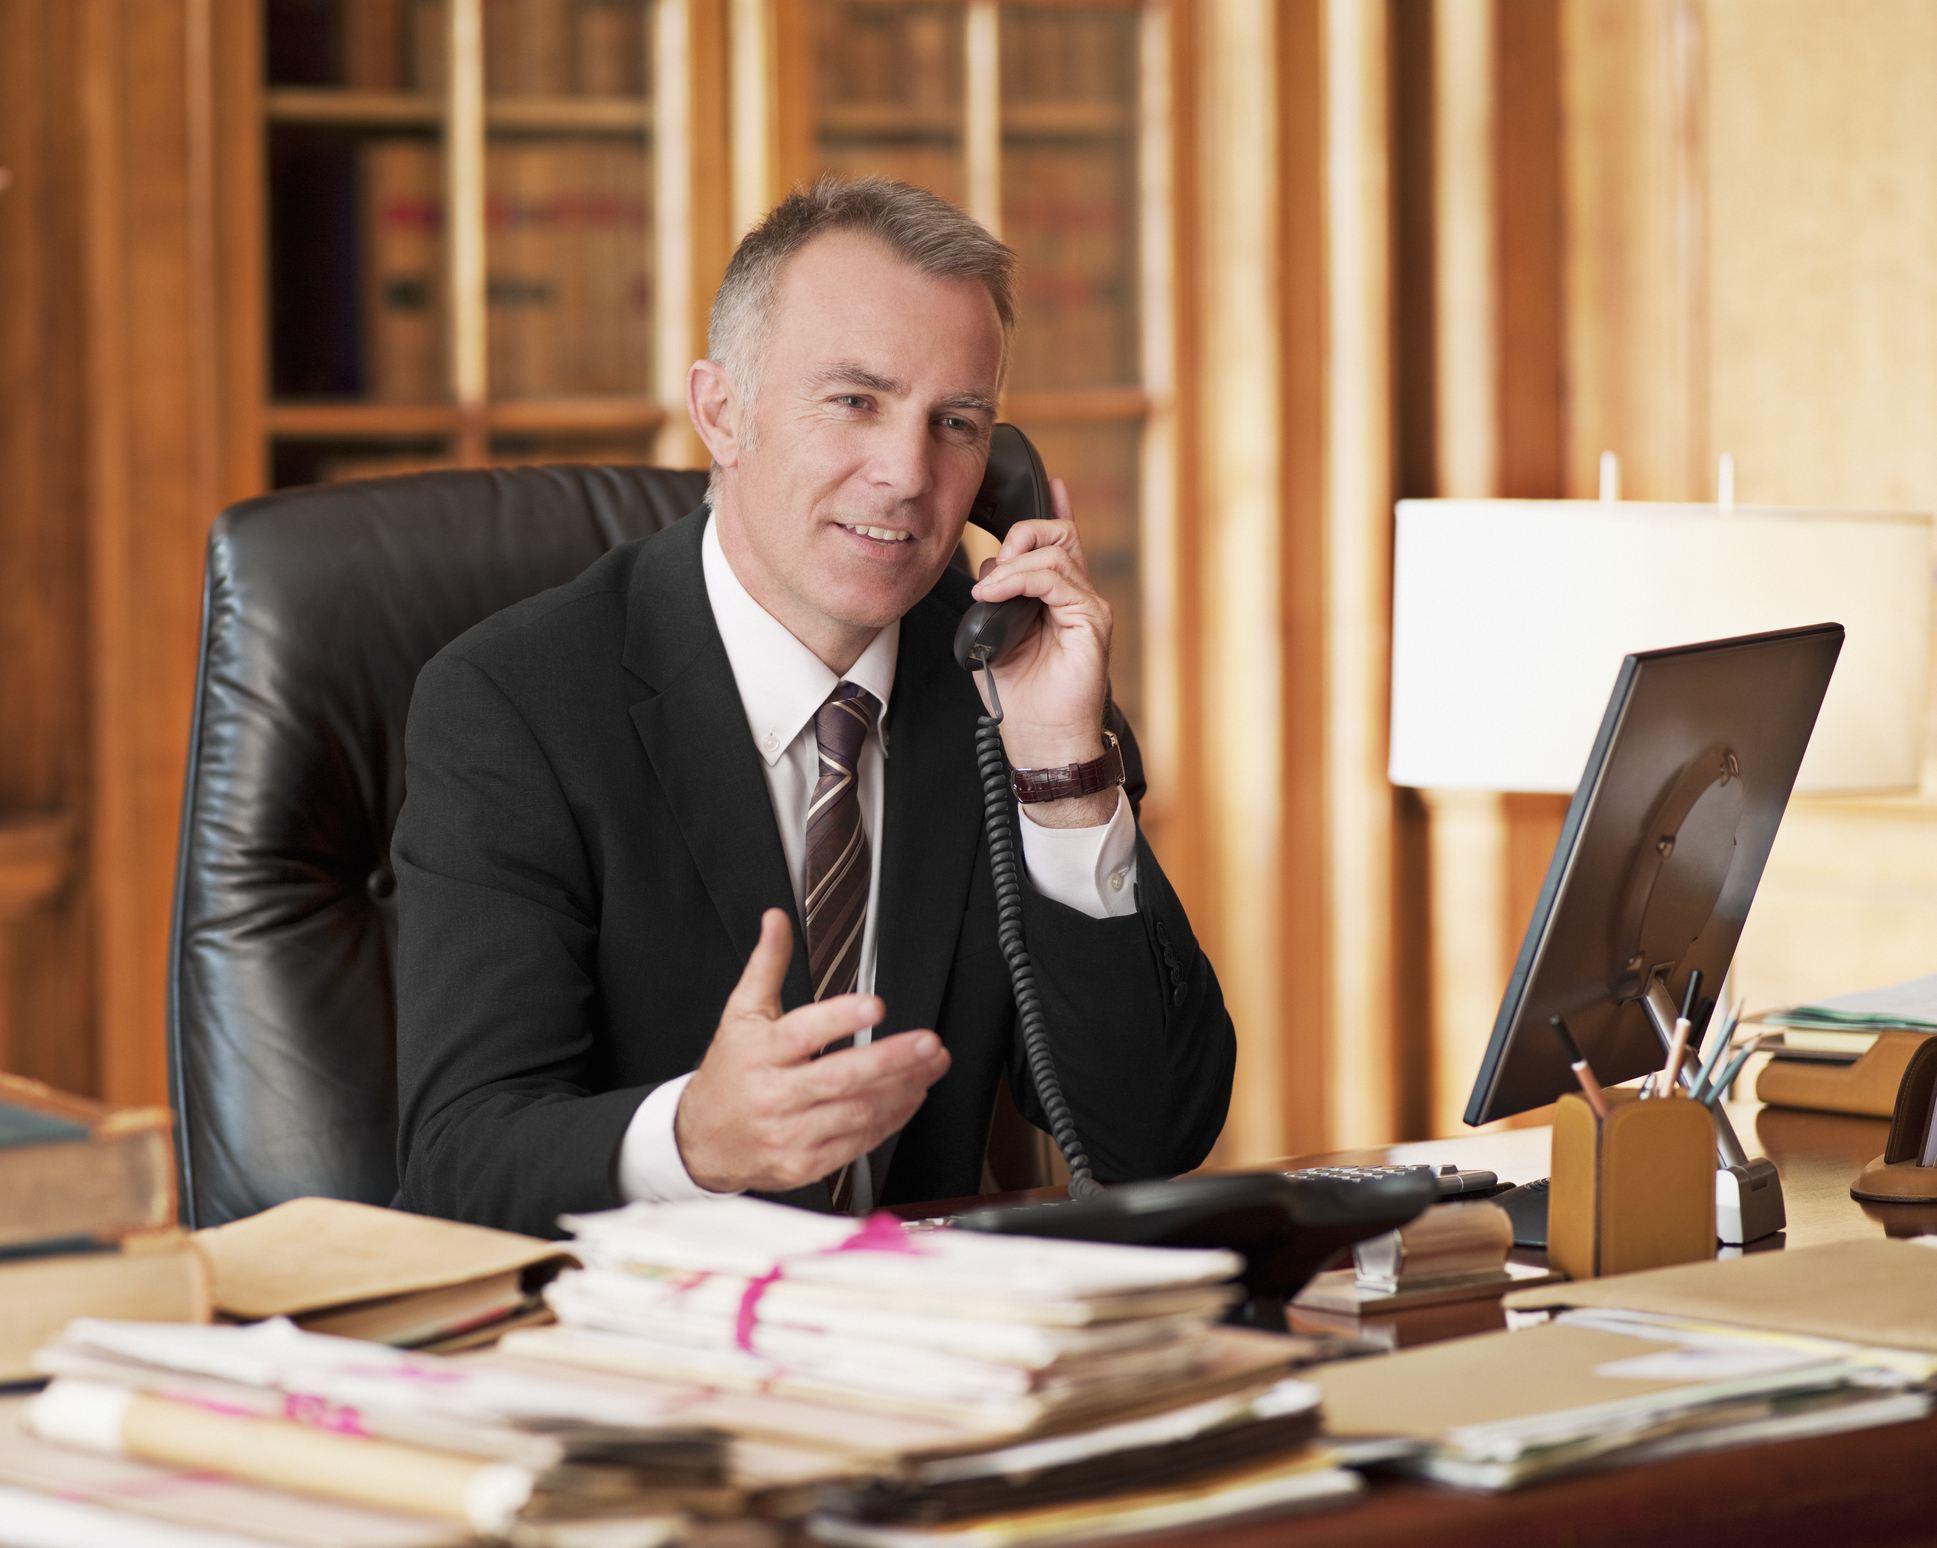 advisor on the phone